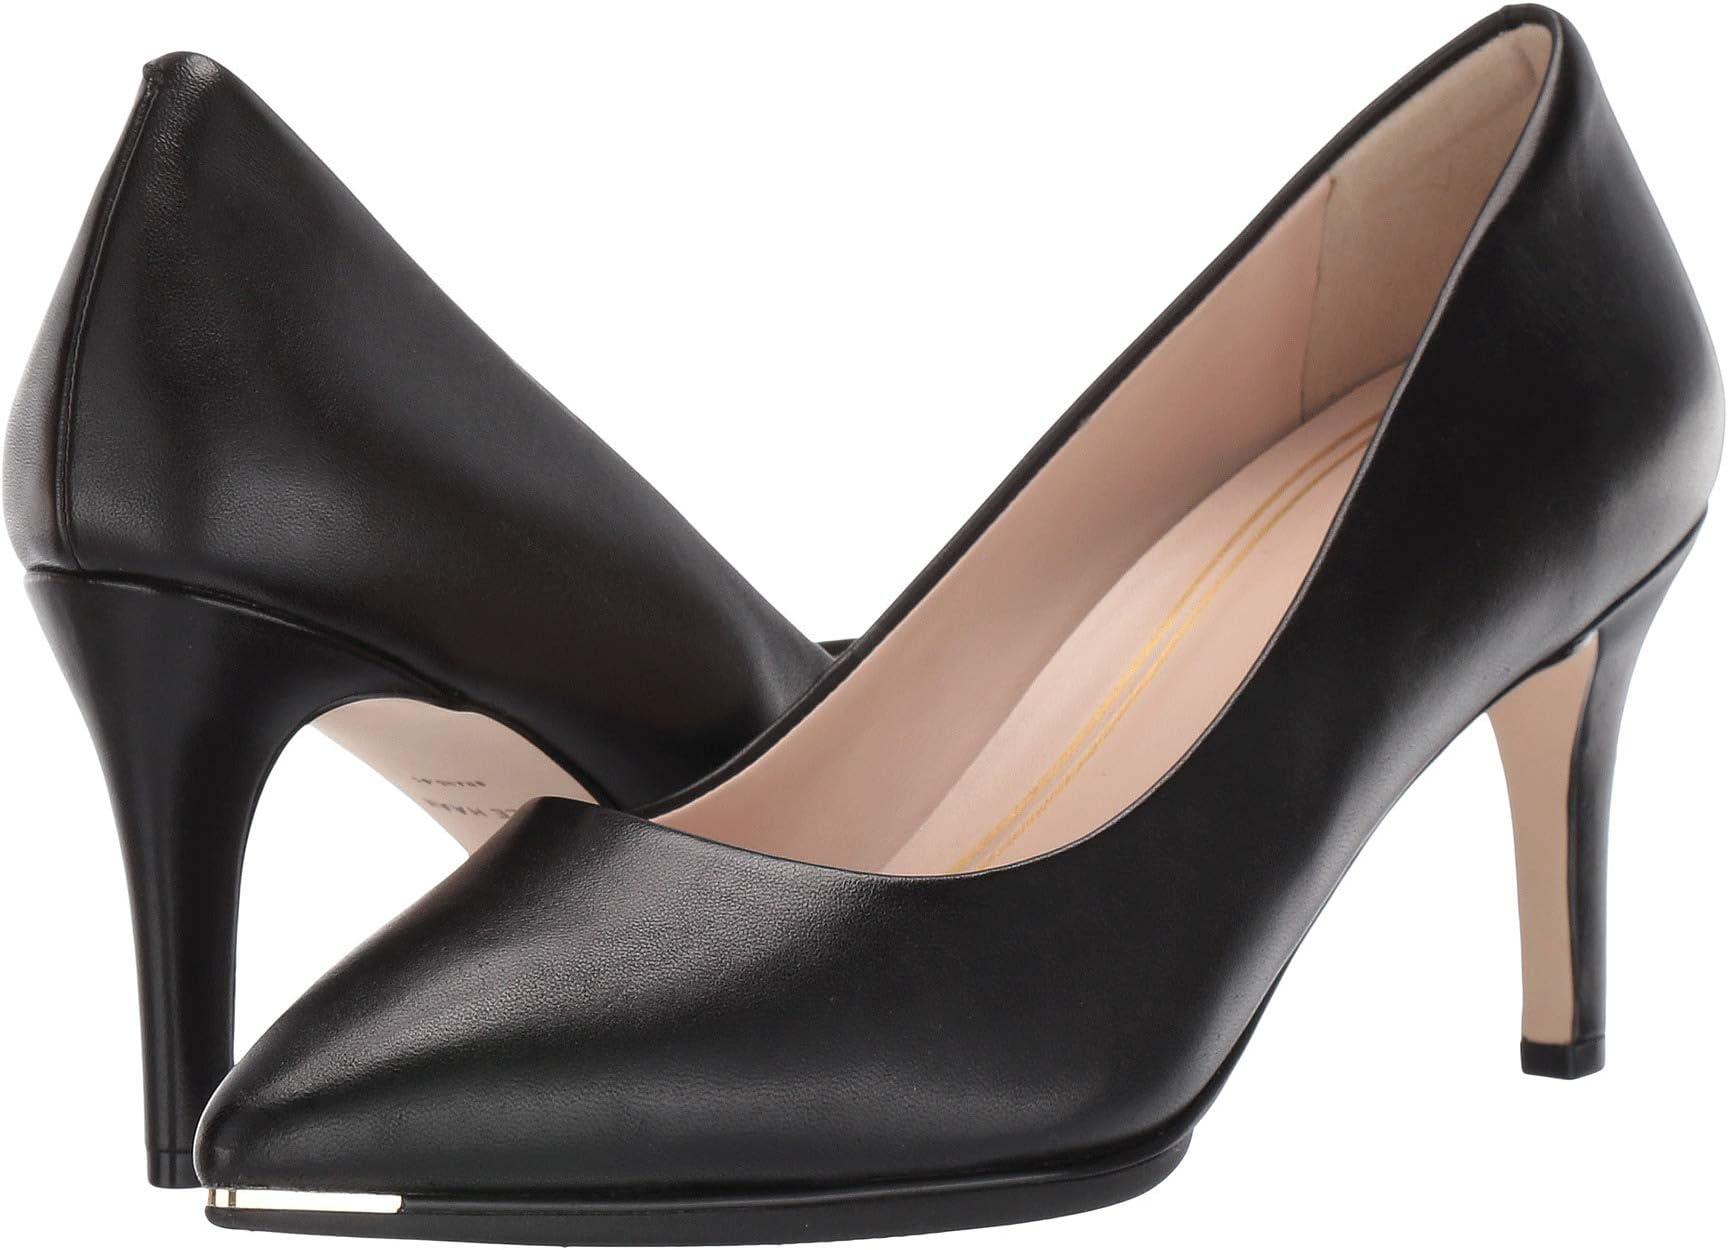 TC-2-Womens-Shoes-2020-03-17